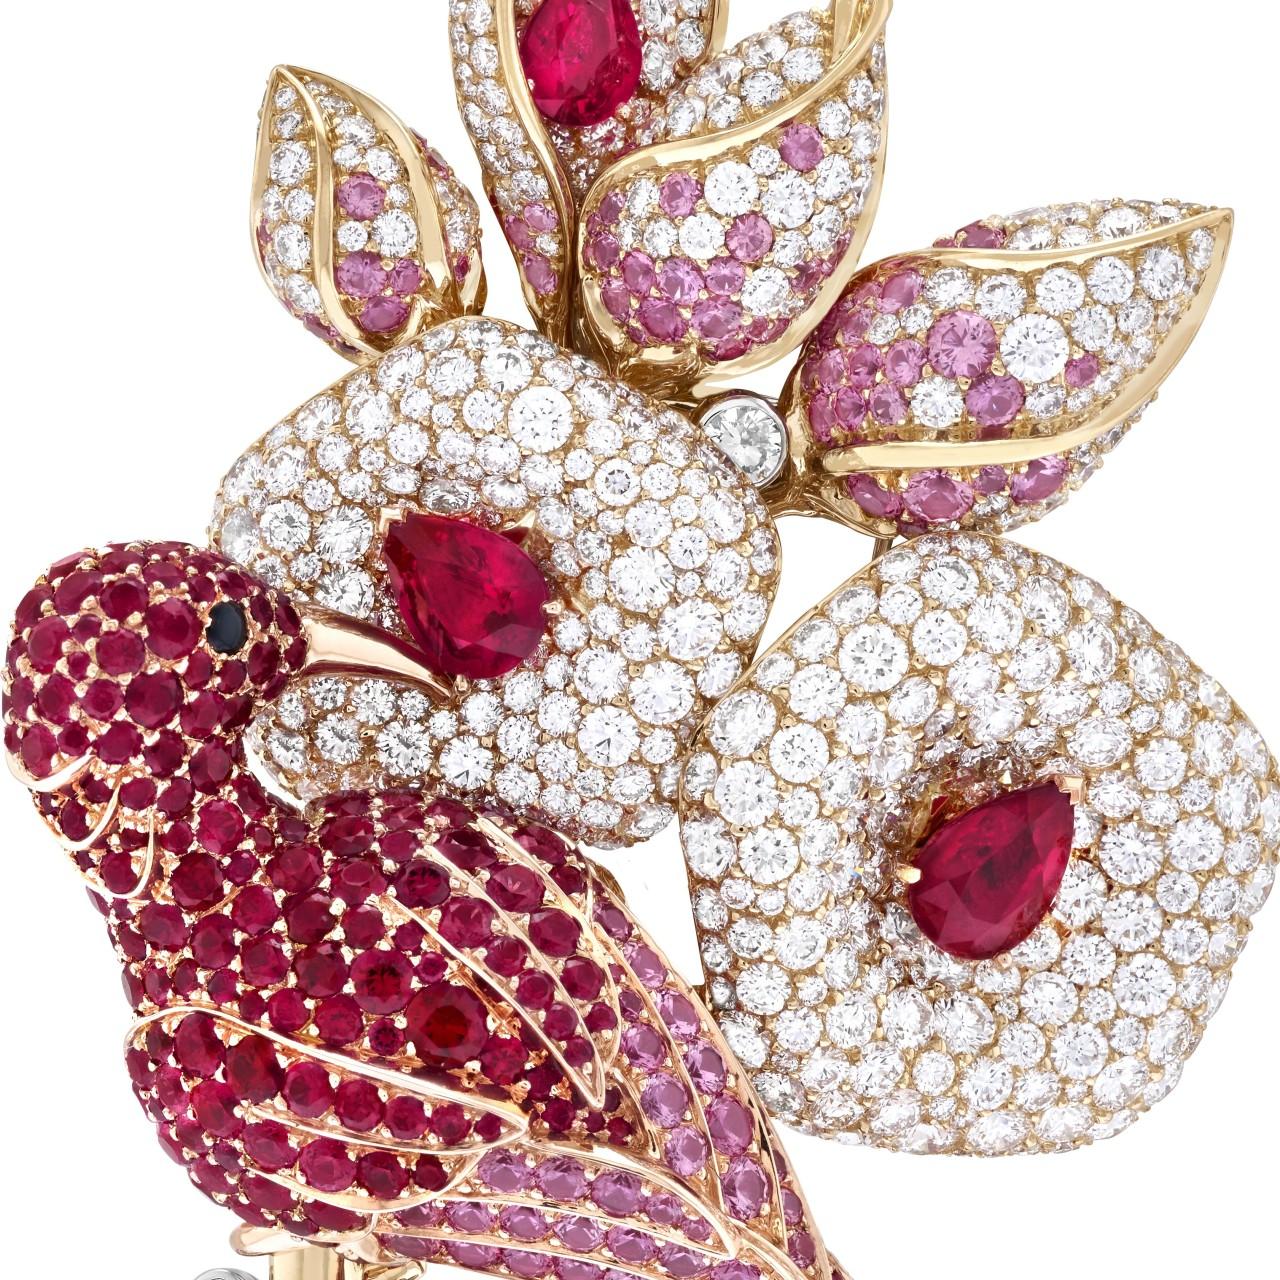 Van Cleef & Arpels' Treasure of Rubies taps into 3,000 carats of